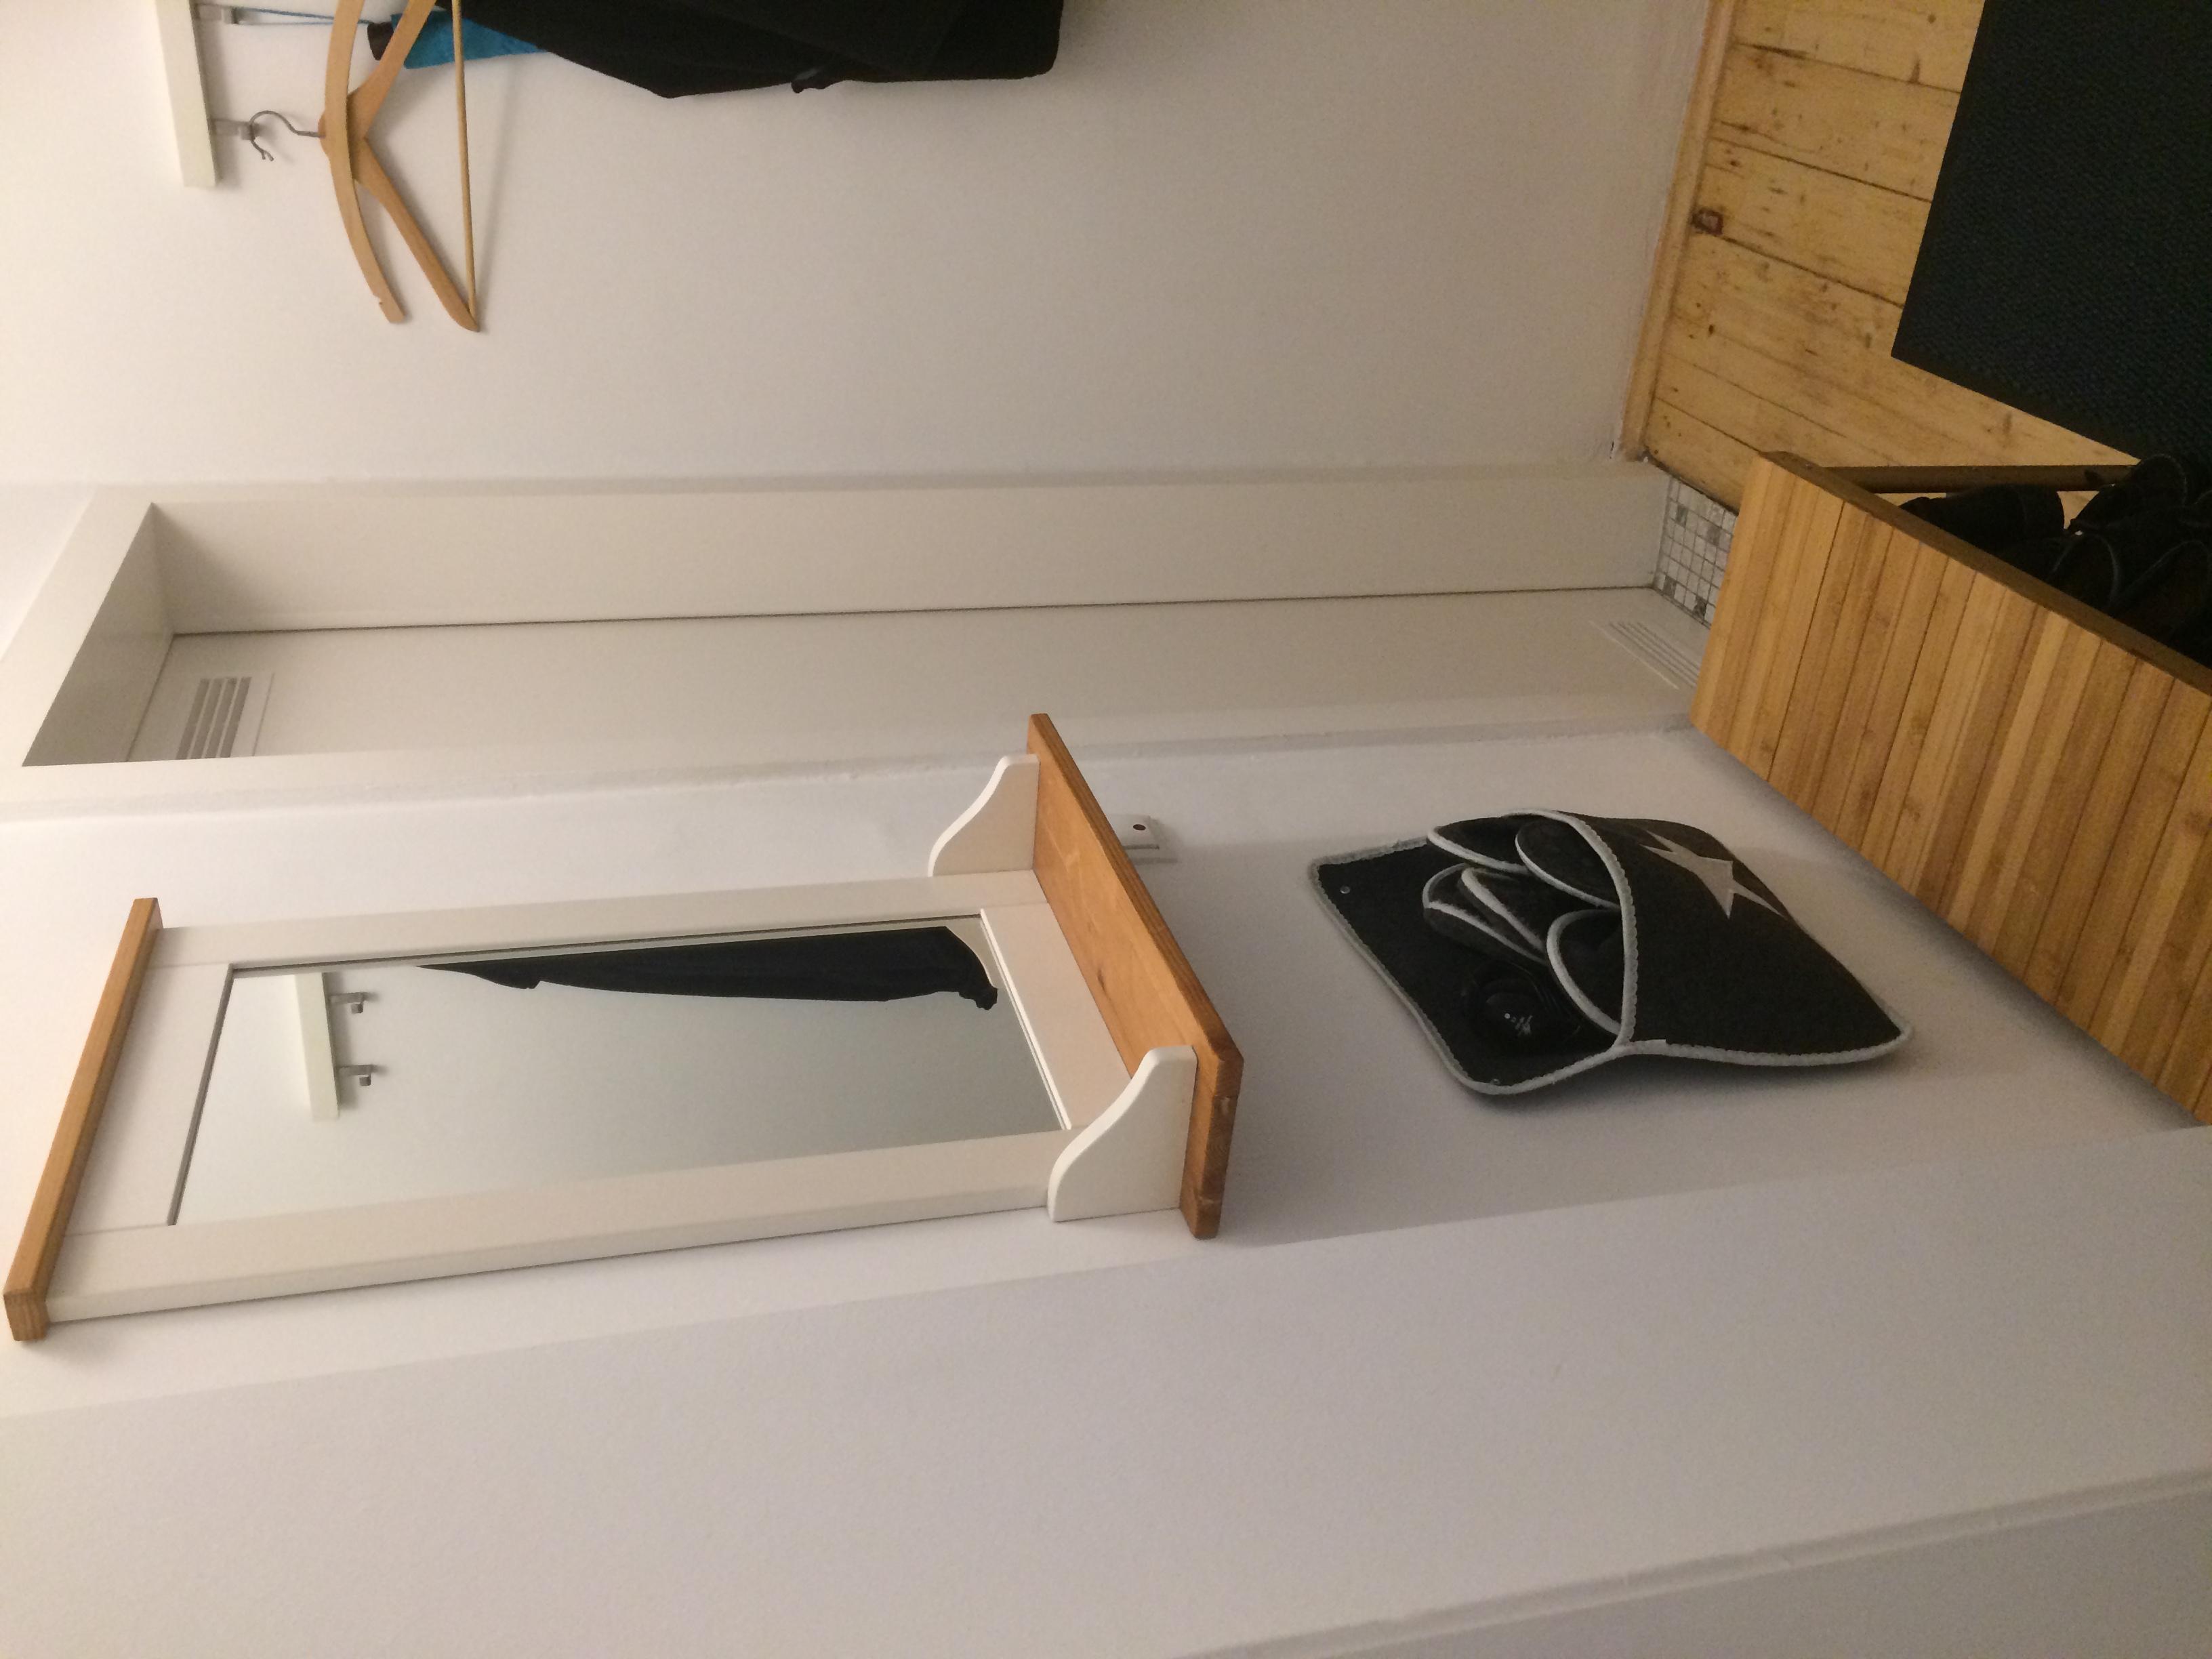 Minimalismus im Badezimmer - Achtsame Lebenskunst